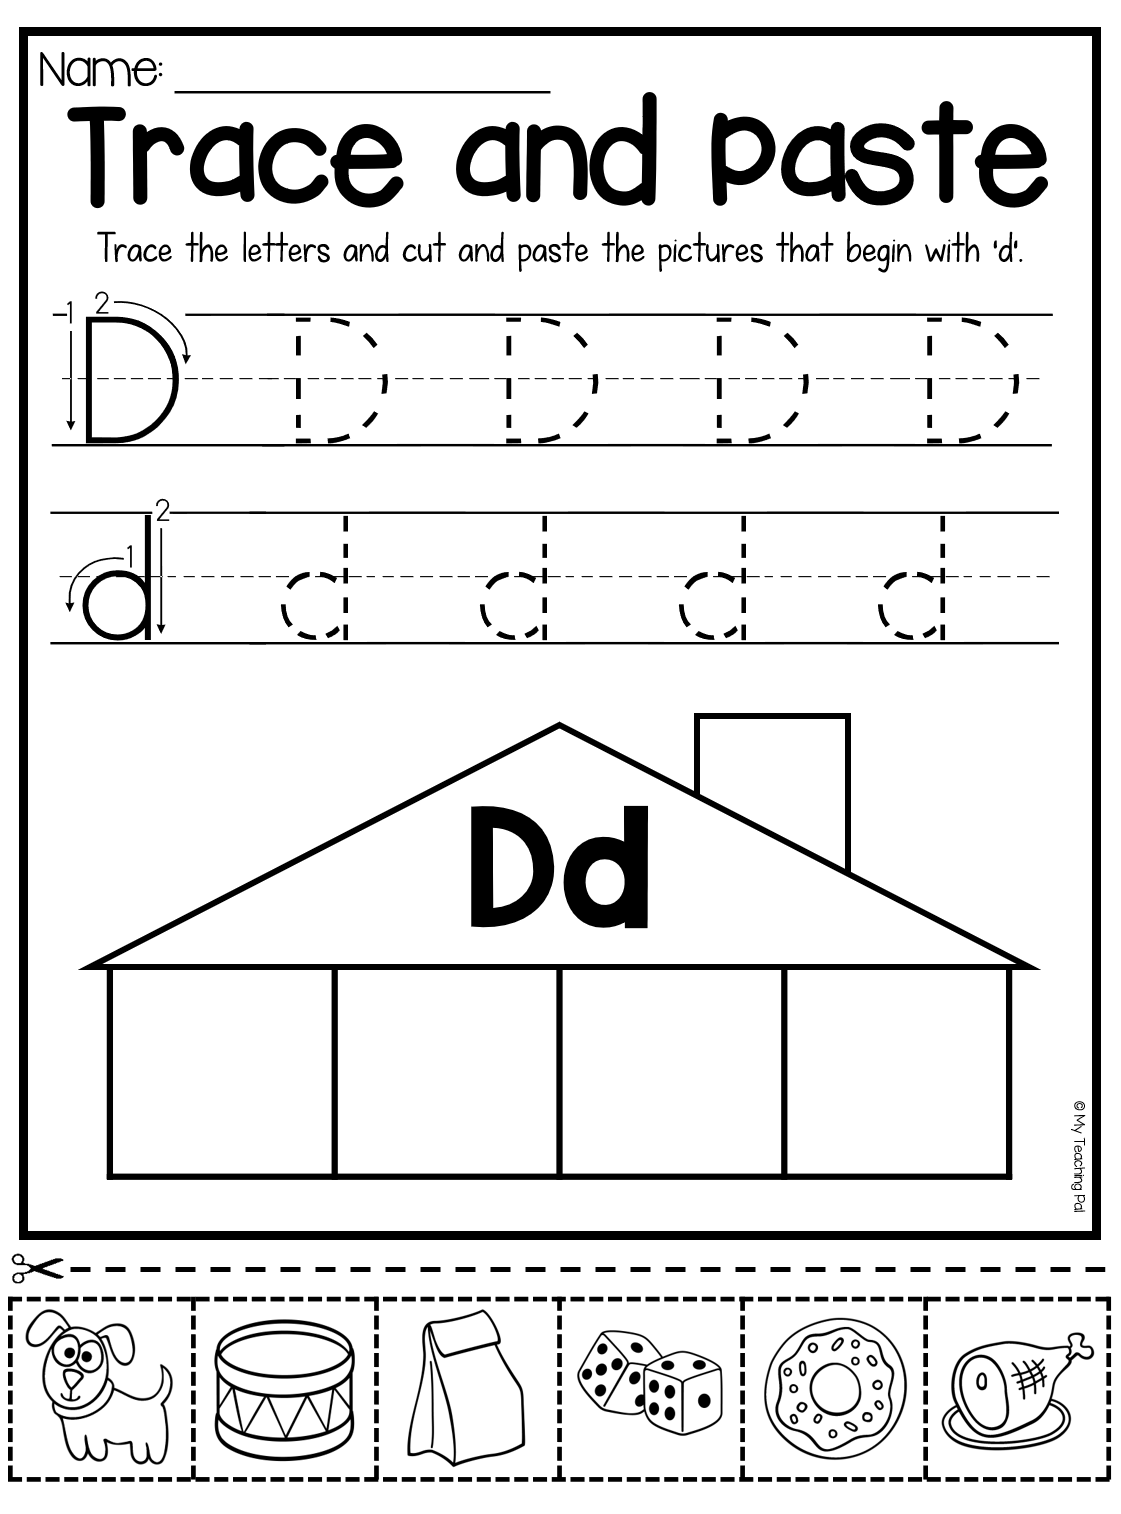 Pin On Literacy Preschool Worksheets